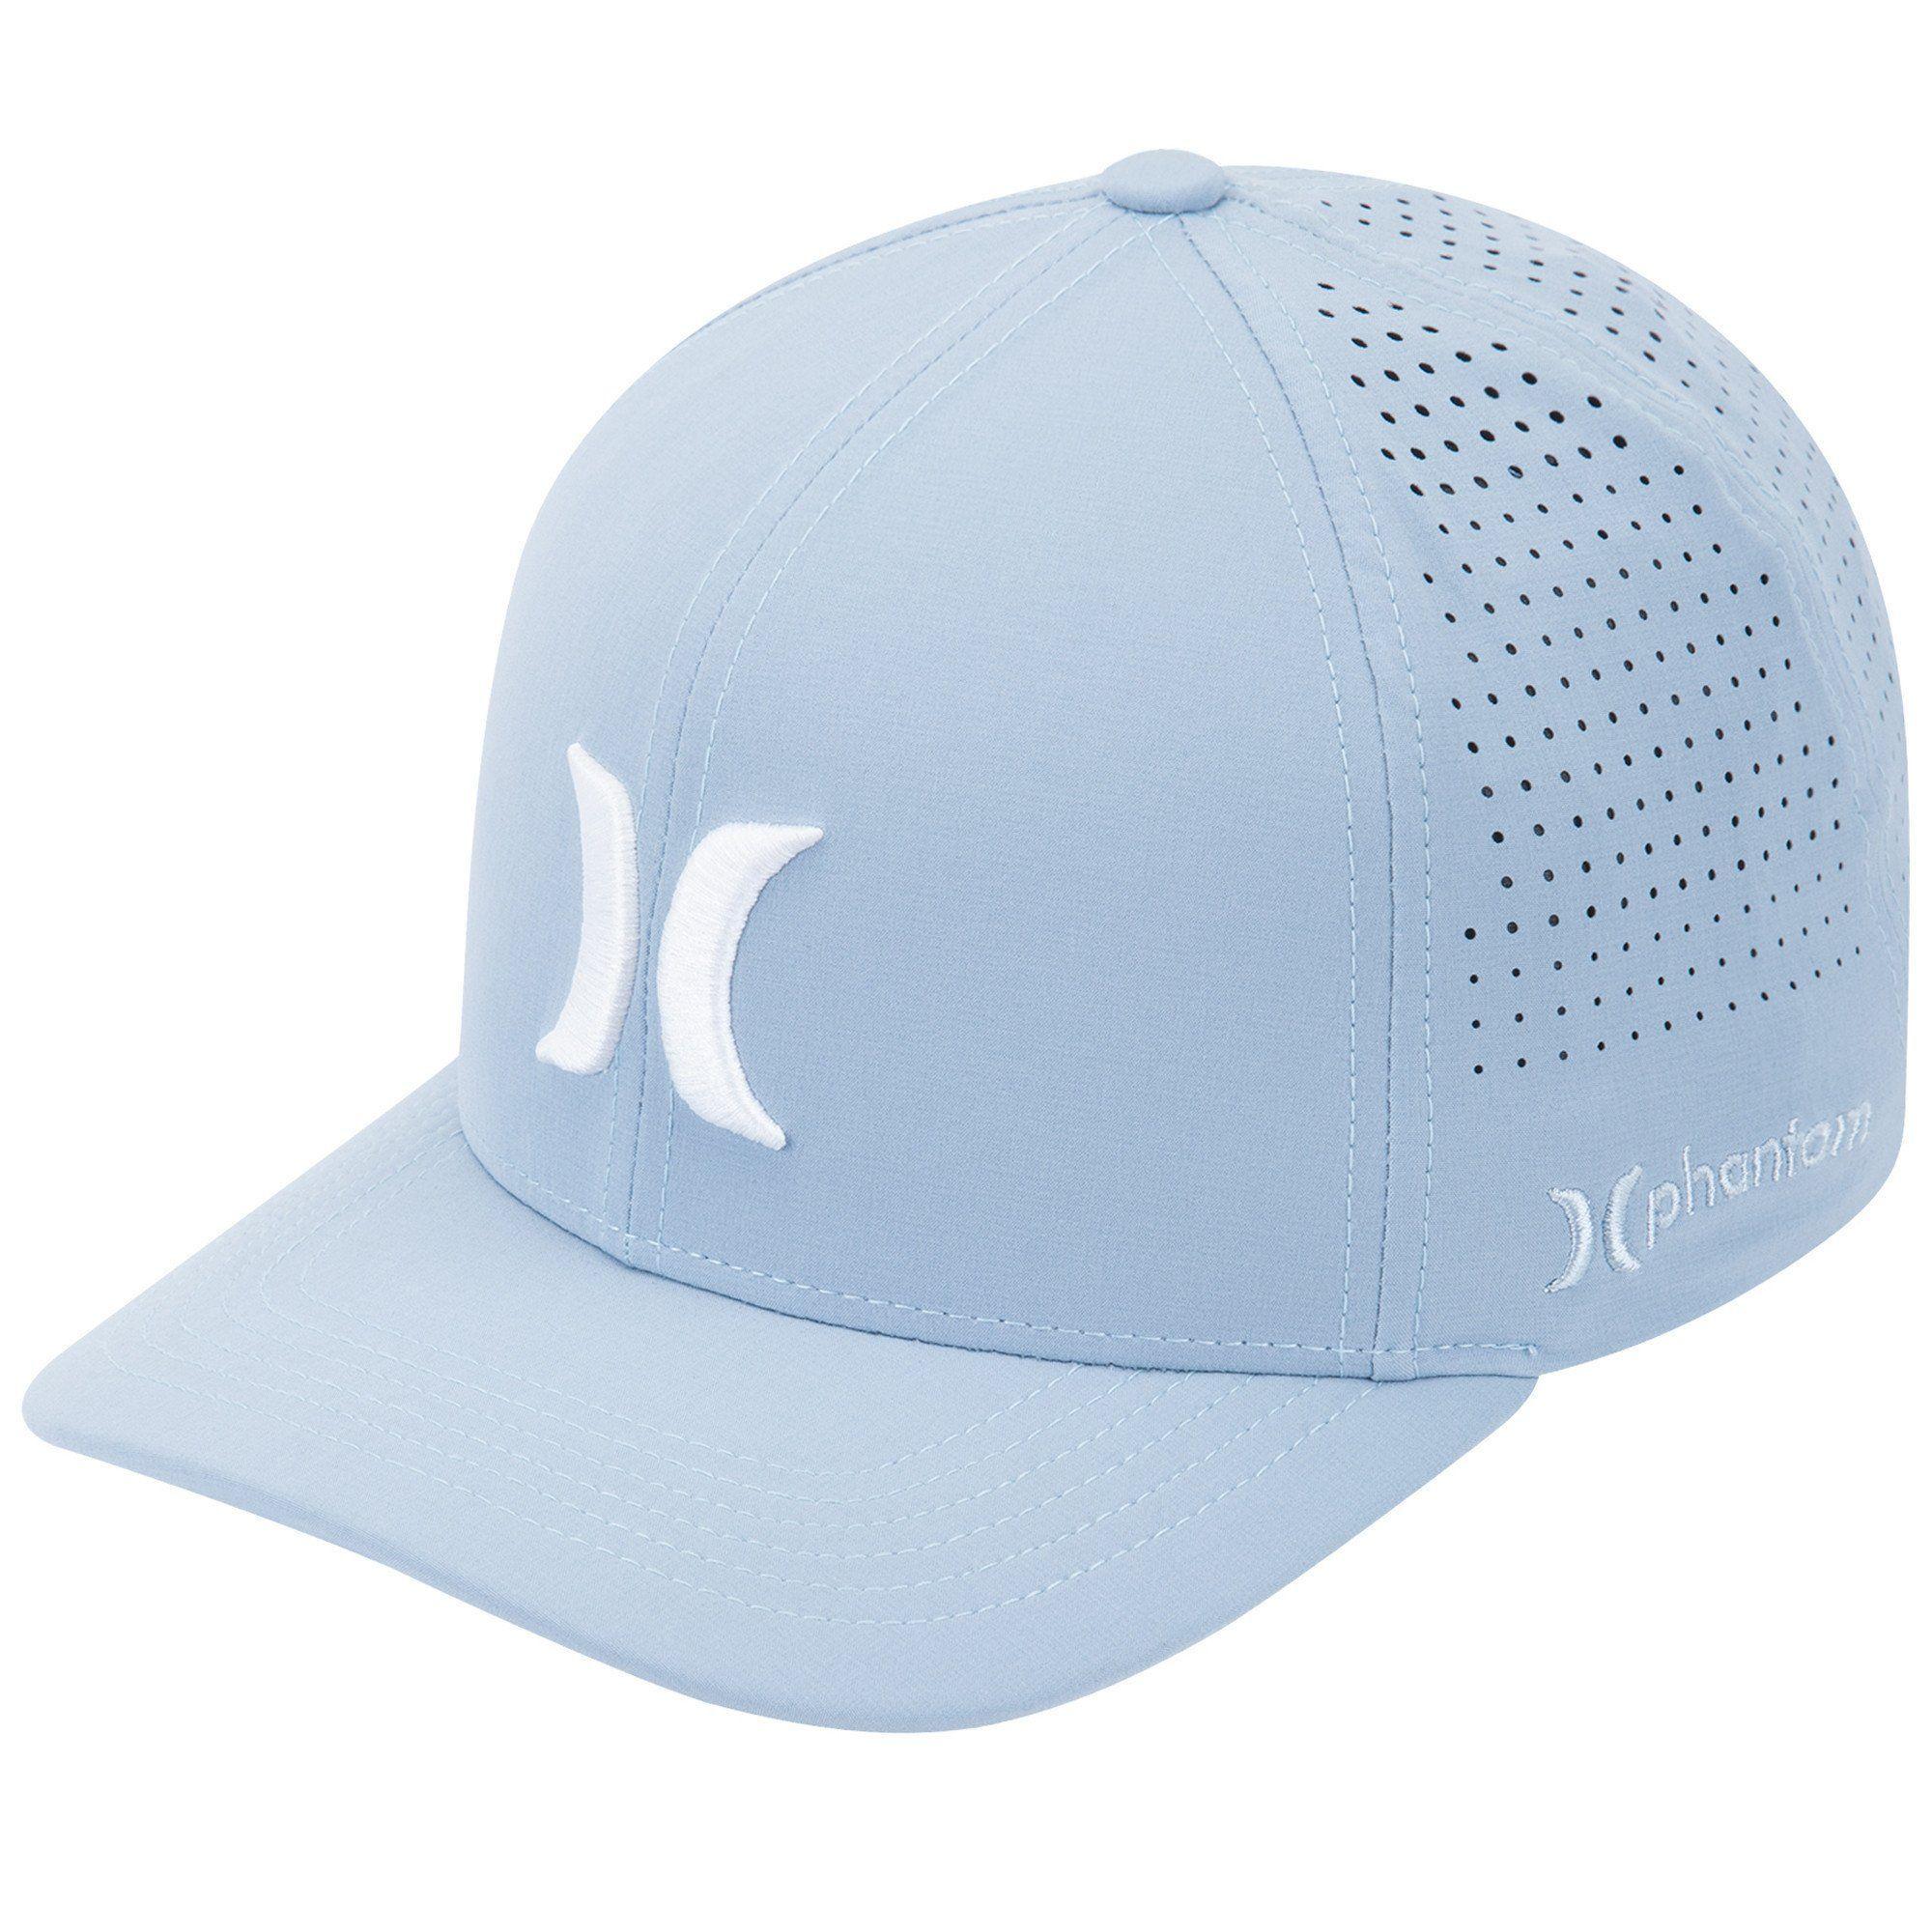 new products 5fa84 2792d Hurley Men s Phantom Vapor 3.0 Hat